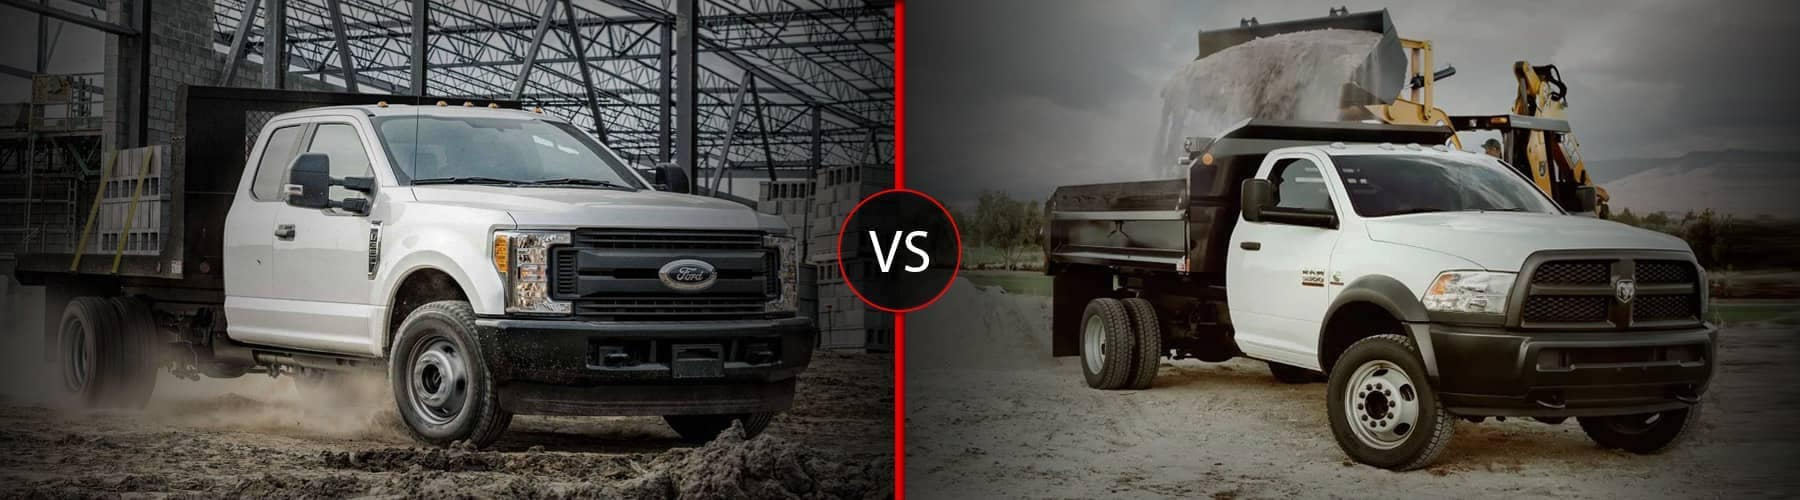 2018 Ram 5500 vs. 2019 Ford F-550